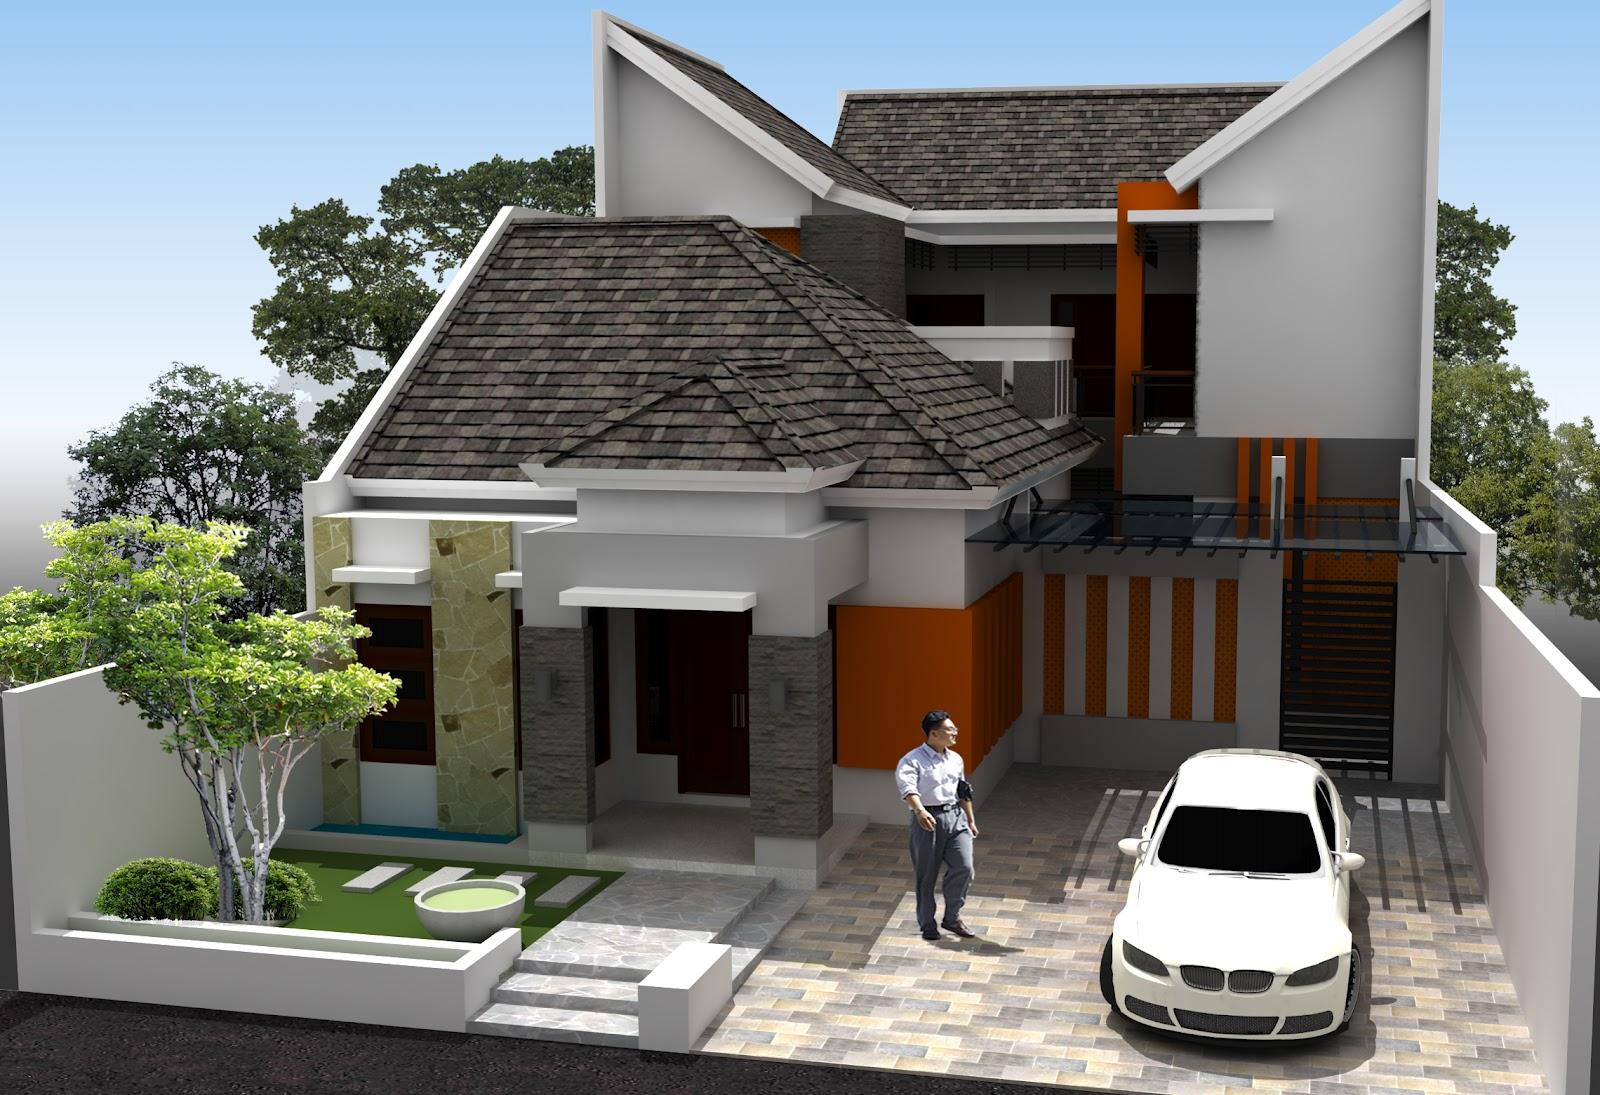 Rumah Minimalis Modern Sederhana Rumah Idaman